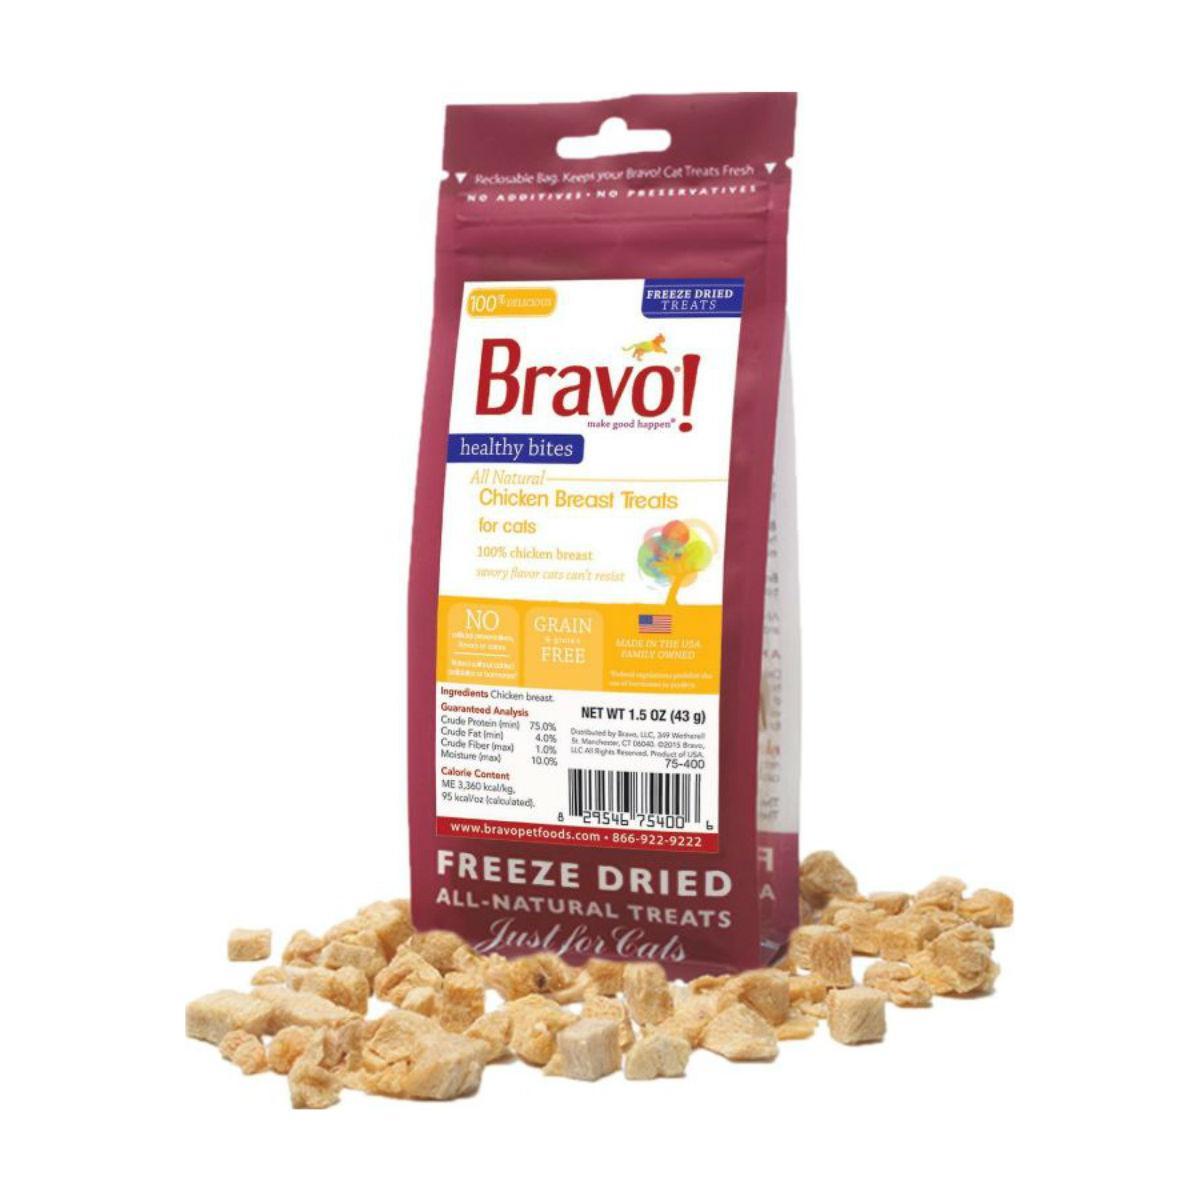 Bravo! Healthy Bites Freeze Dried Cat Treats - Chicken Breast